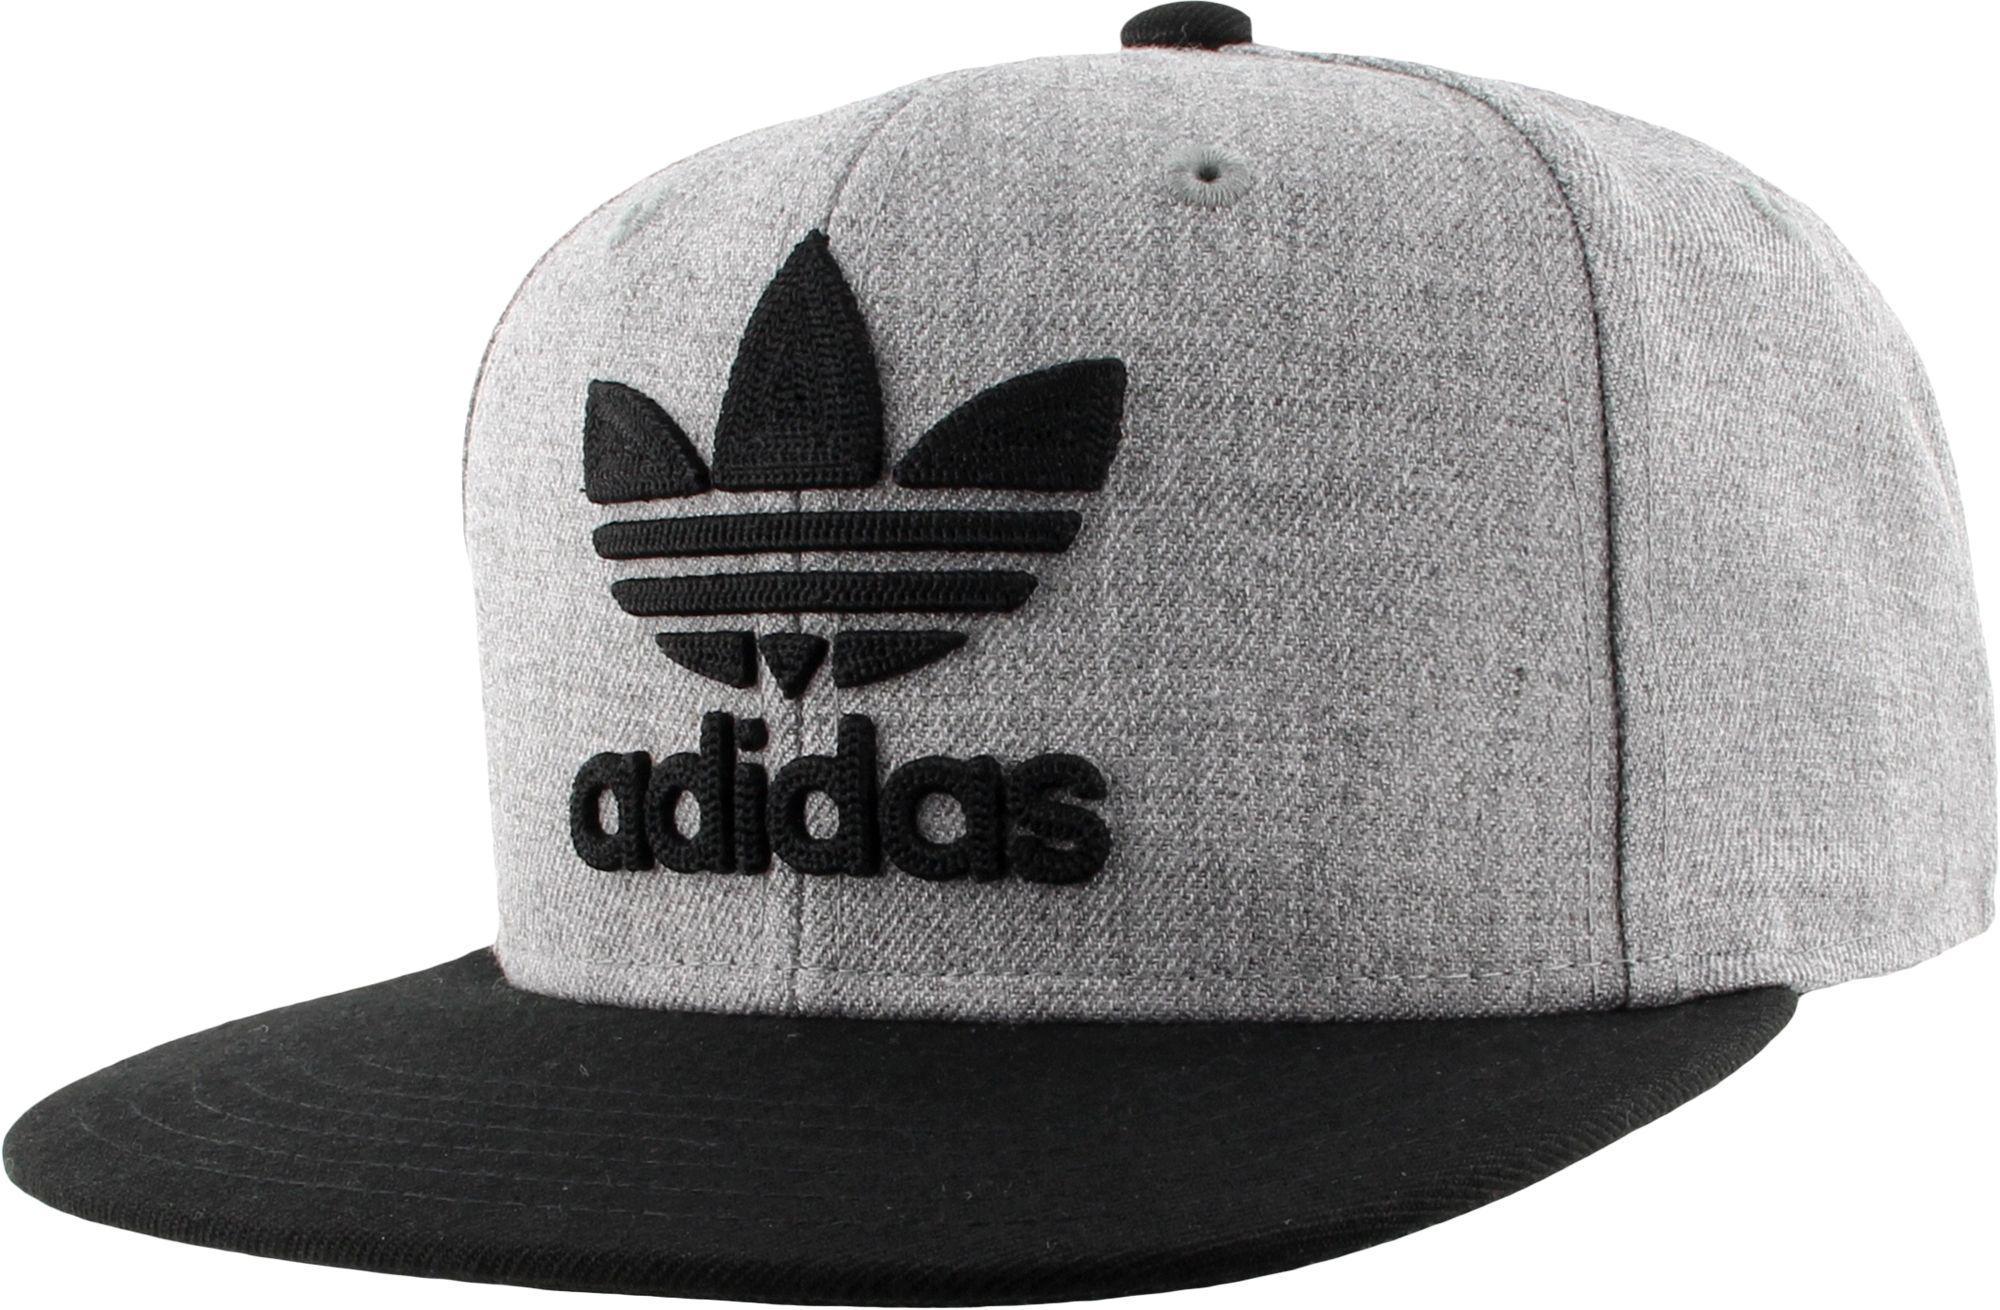 Lyst - adidas Originals Trefoil Chain Snapback Hat in Gray for Men 3a32066c29af